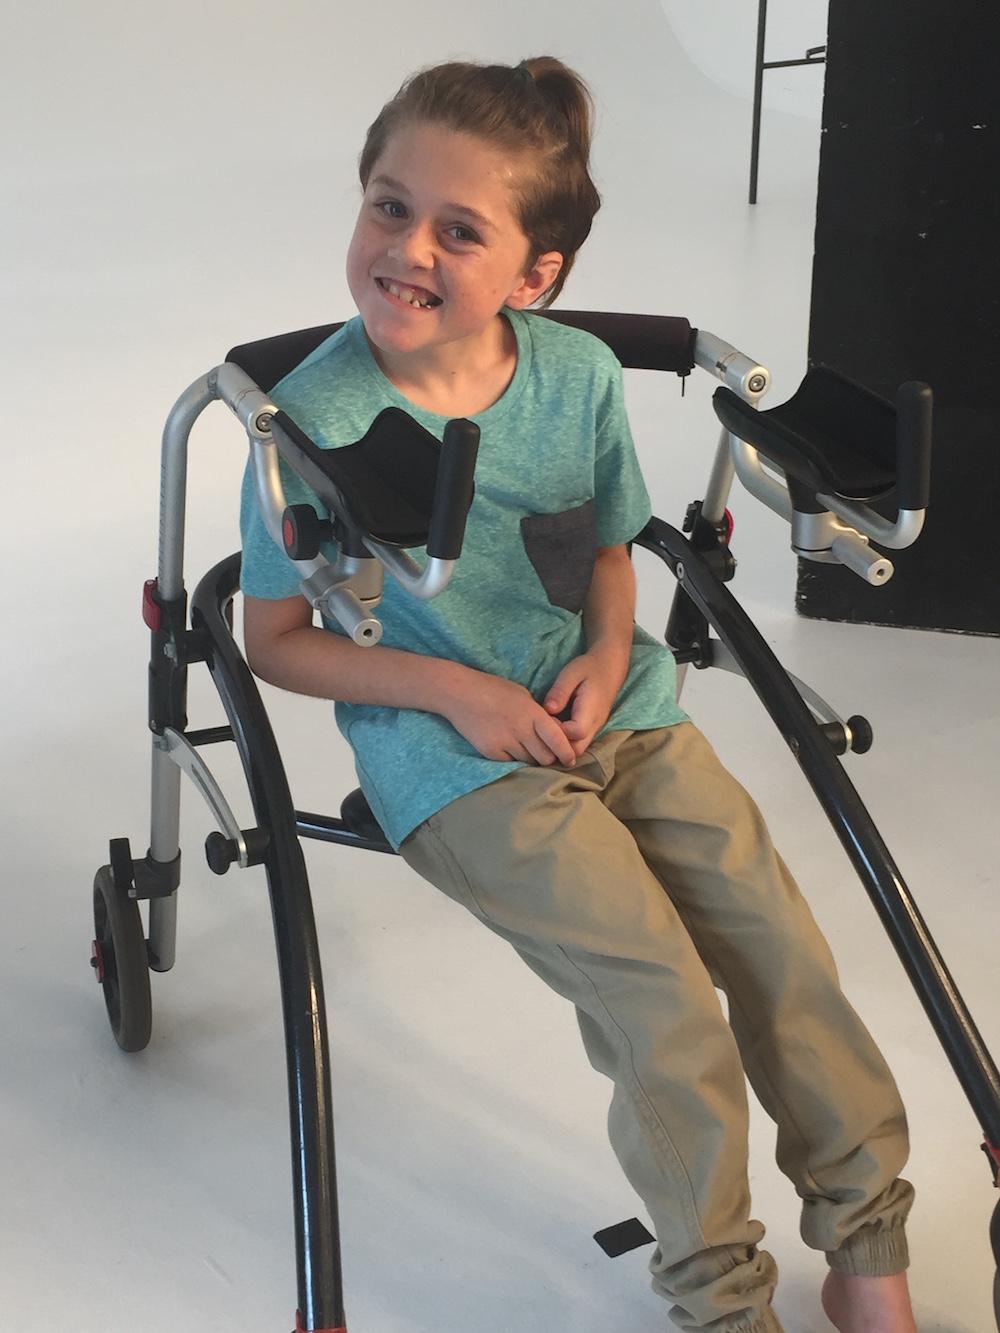 cooper smiling on set